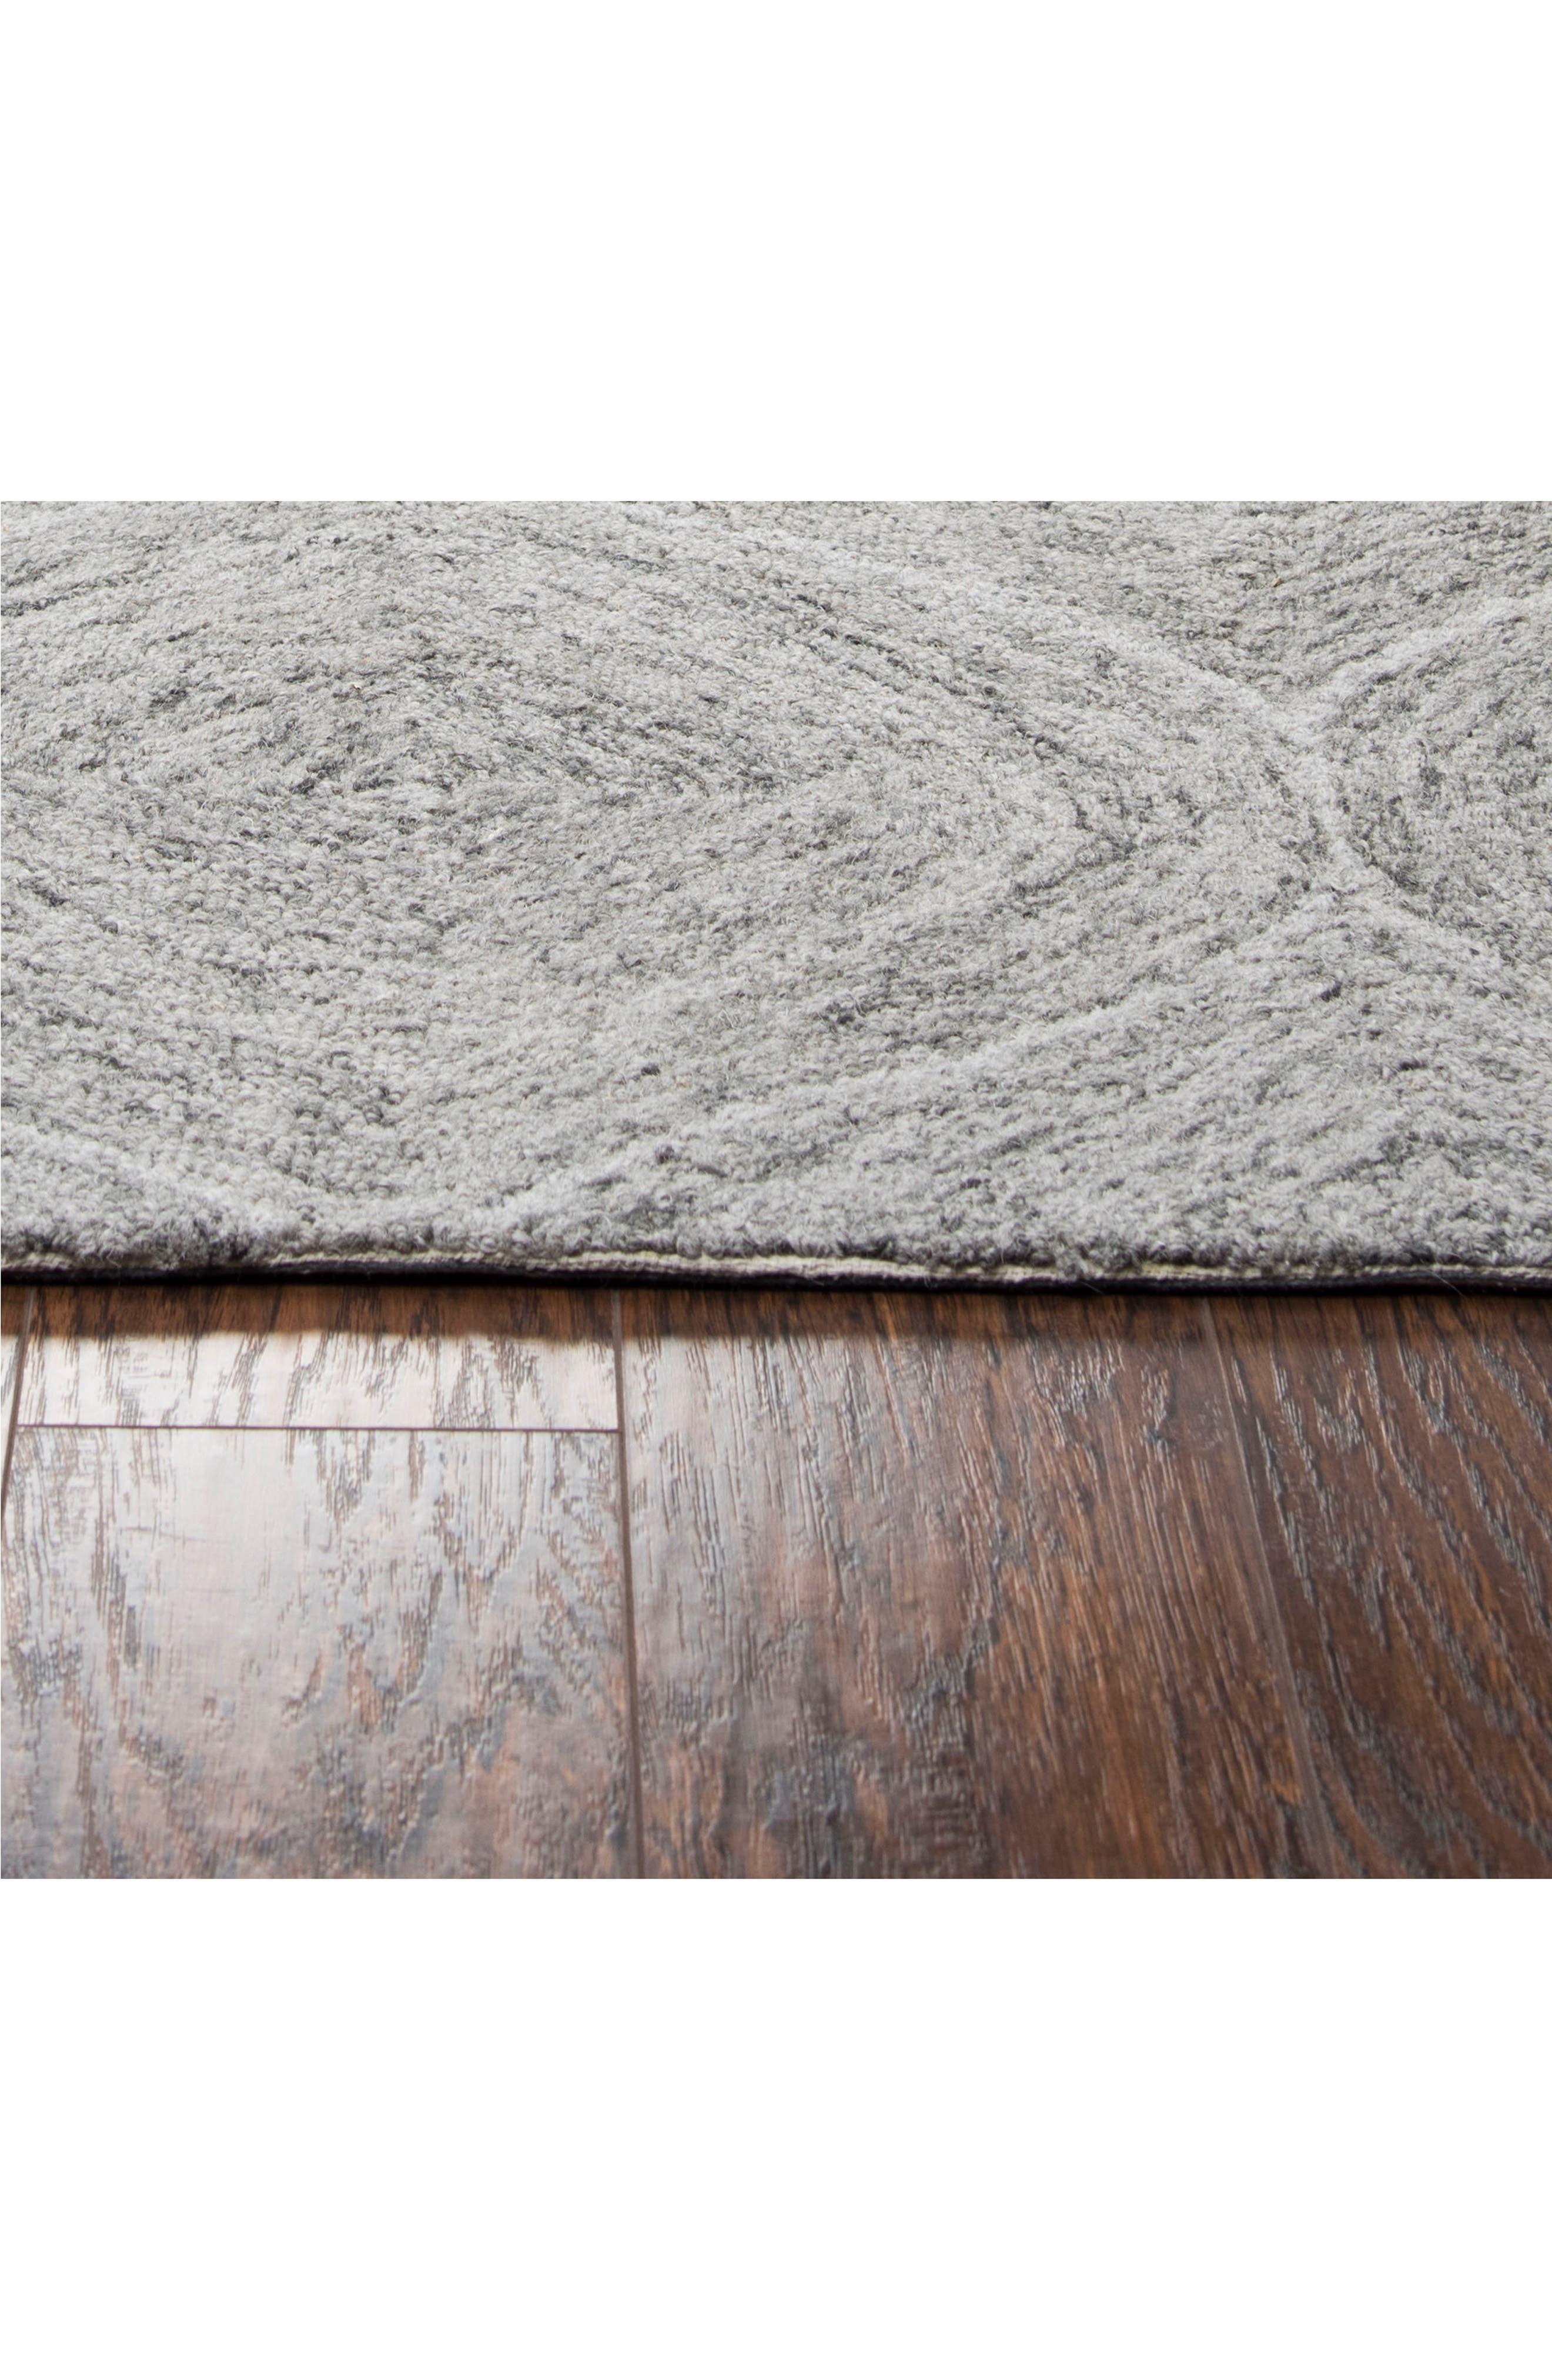 Irregular Diamond Hand Tufted Wool Area Rug,                             Alternate thumbnail 3, color,                             Grey